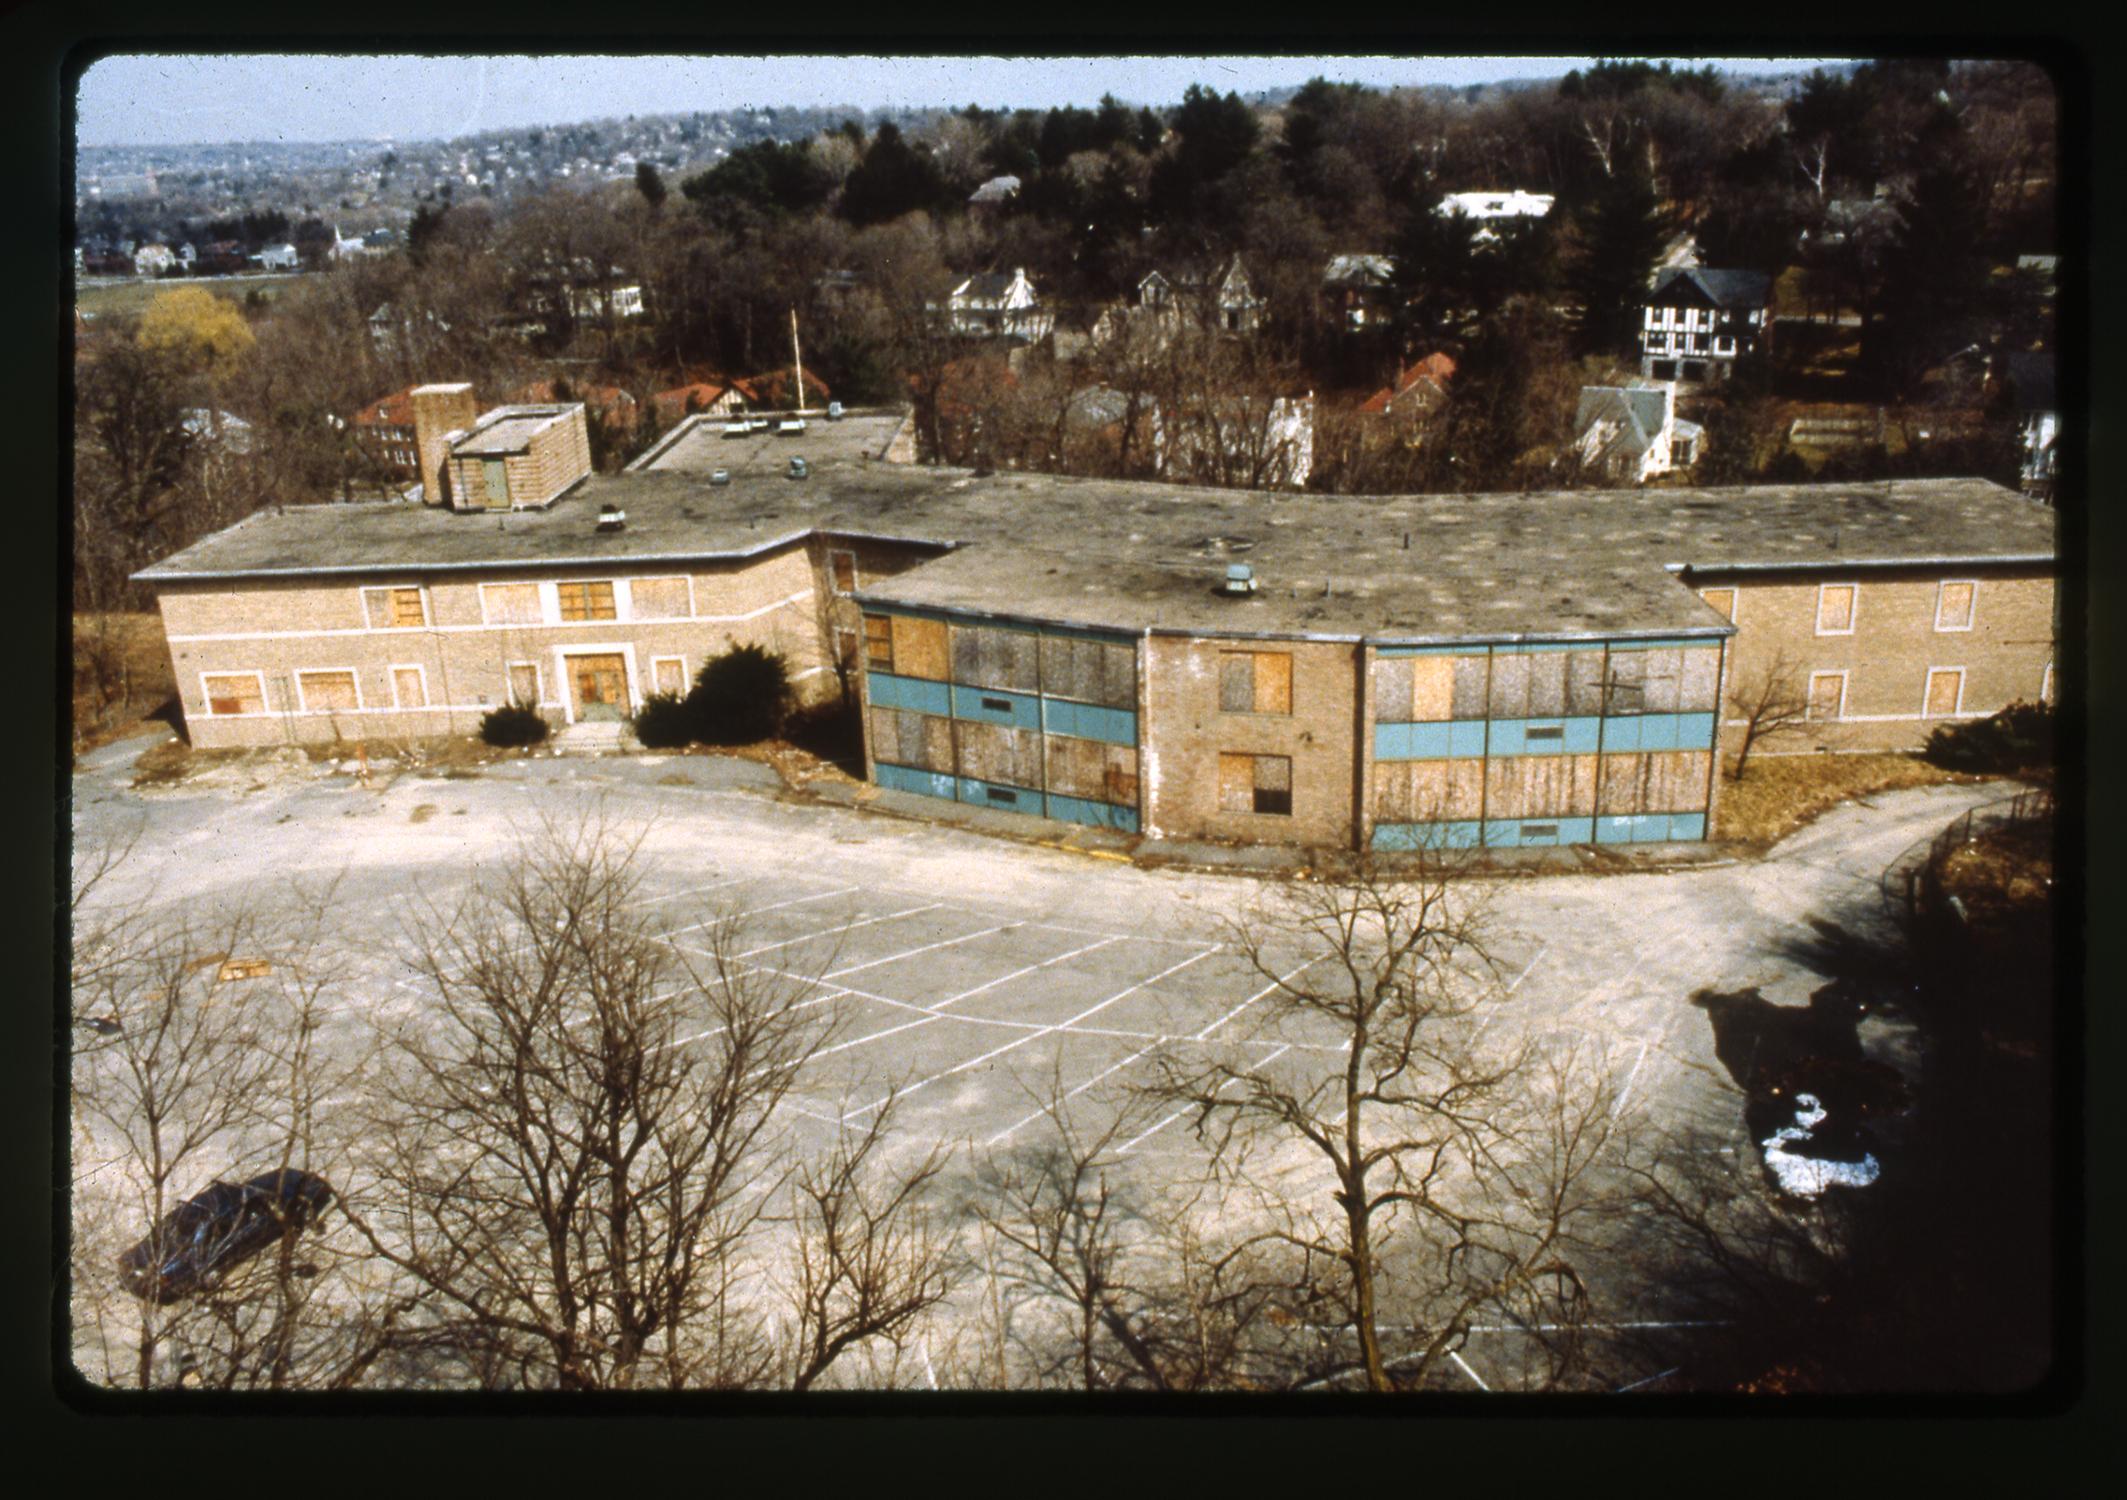 ABANDONED CLAFLIN SCHOOL